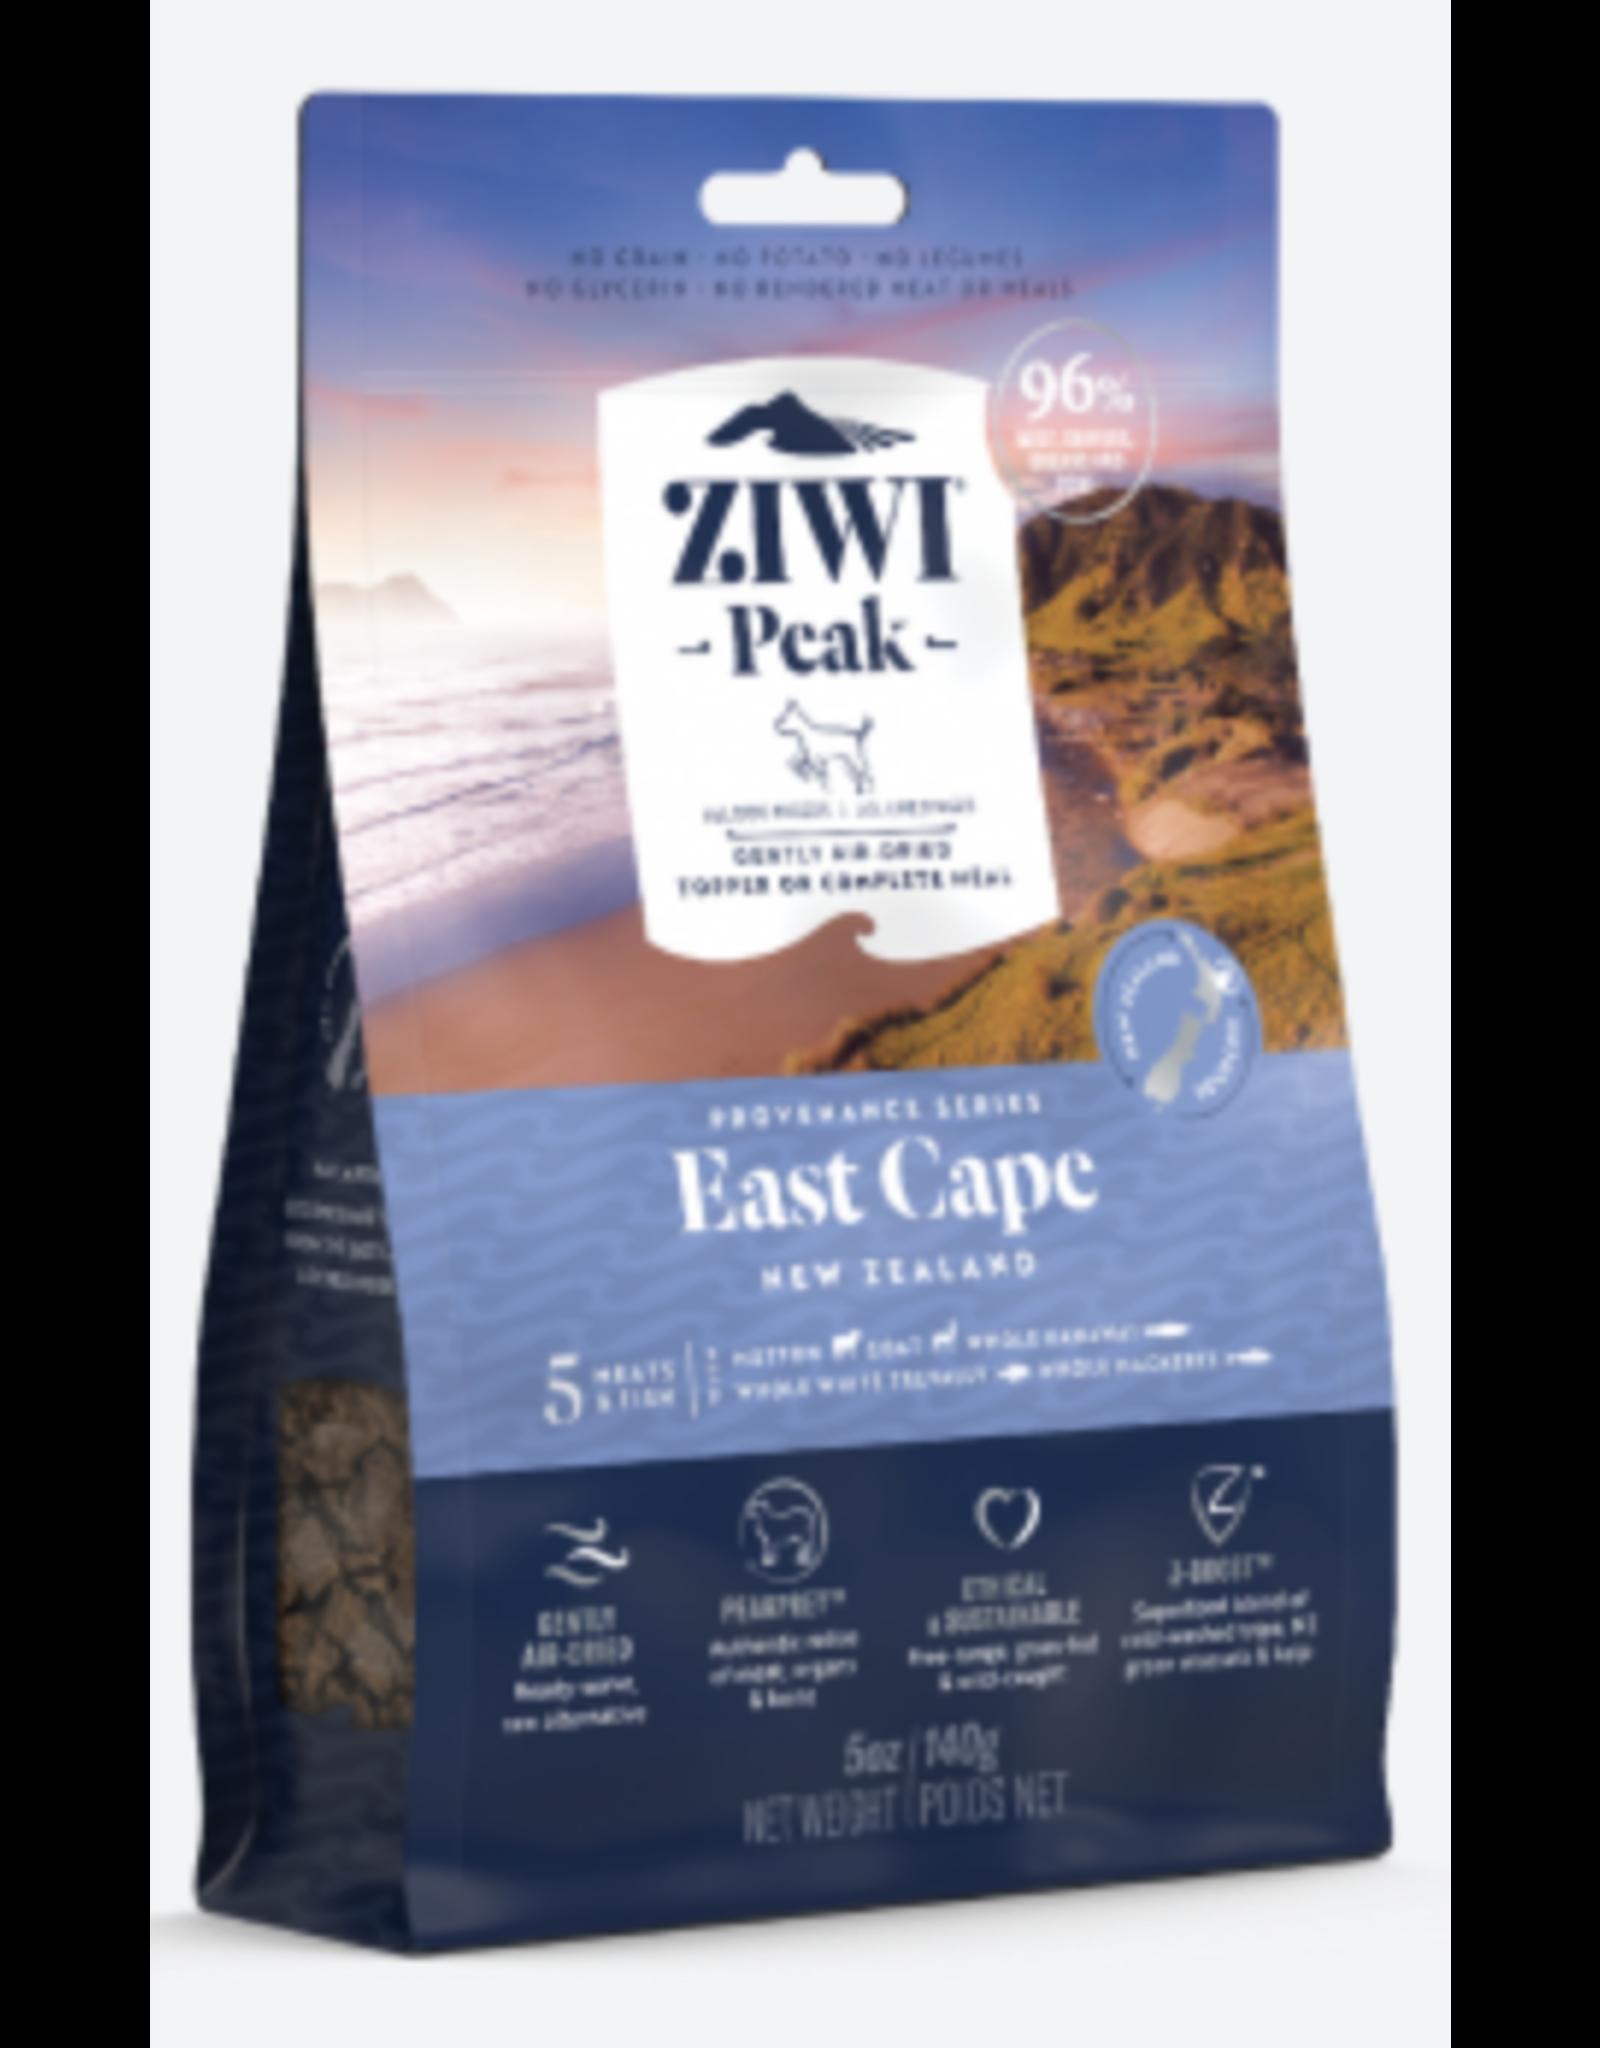 Ziwi Peak Ziwi - Provenance - East Cape - Air-Dried - 900g